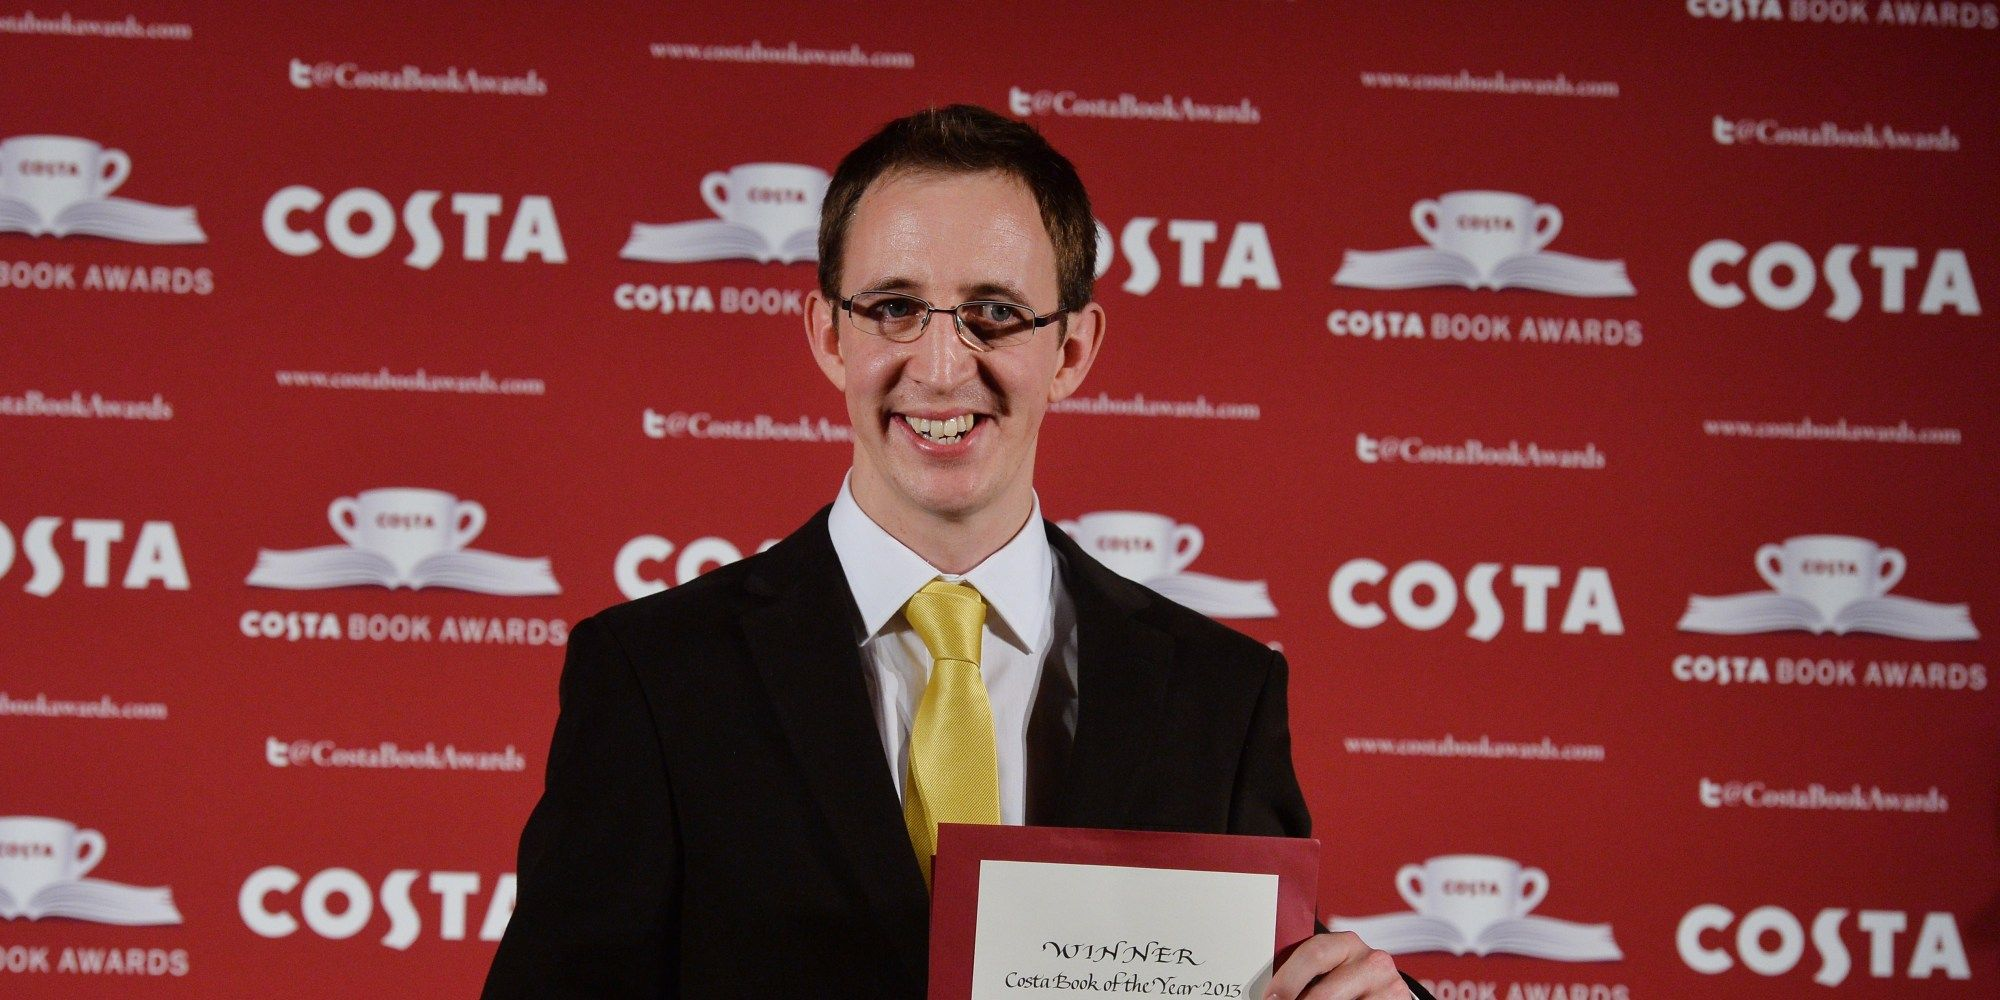 Nurse Nathan Filer Wins Britain's Costa Book Award